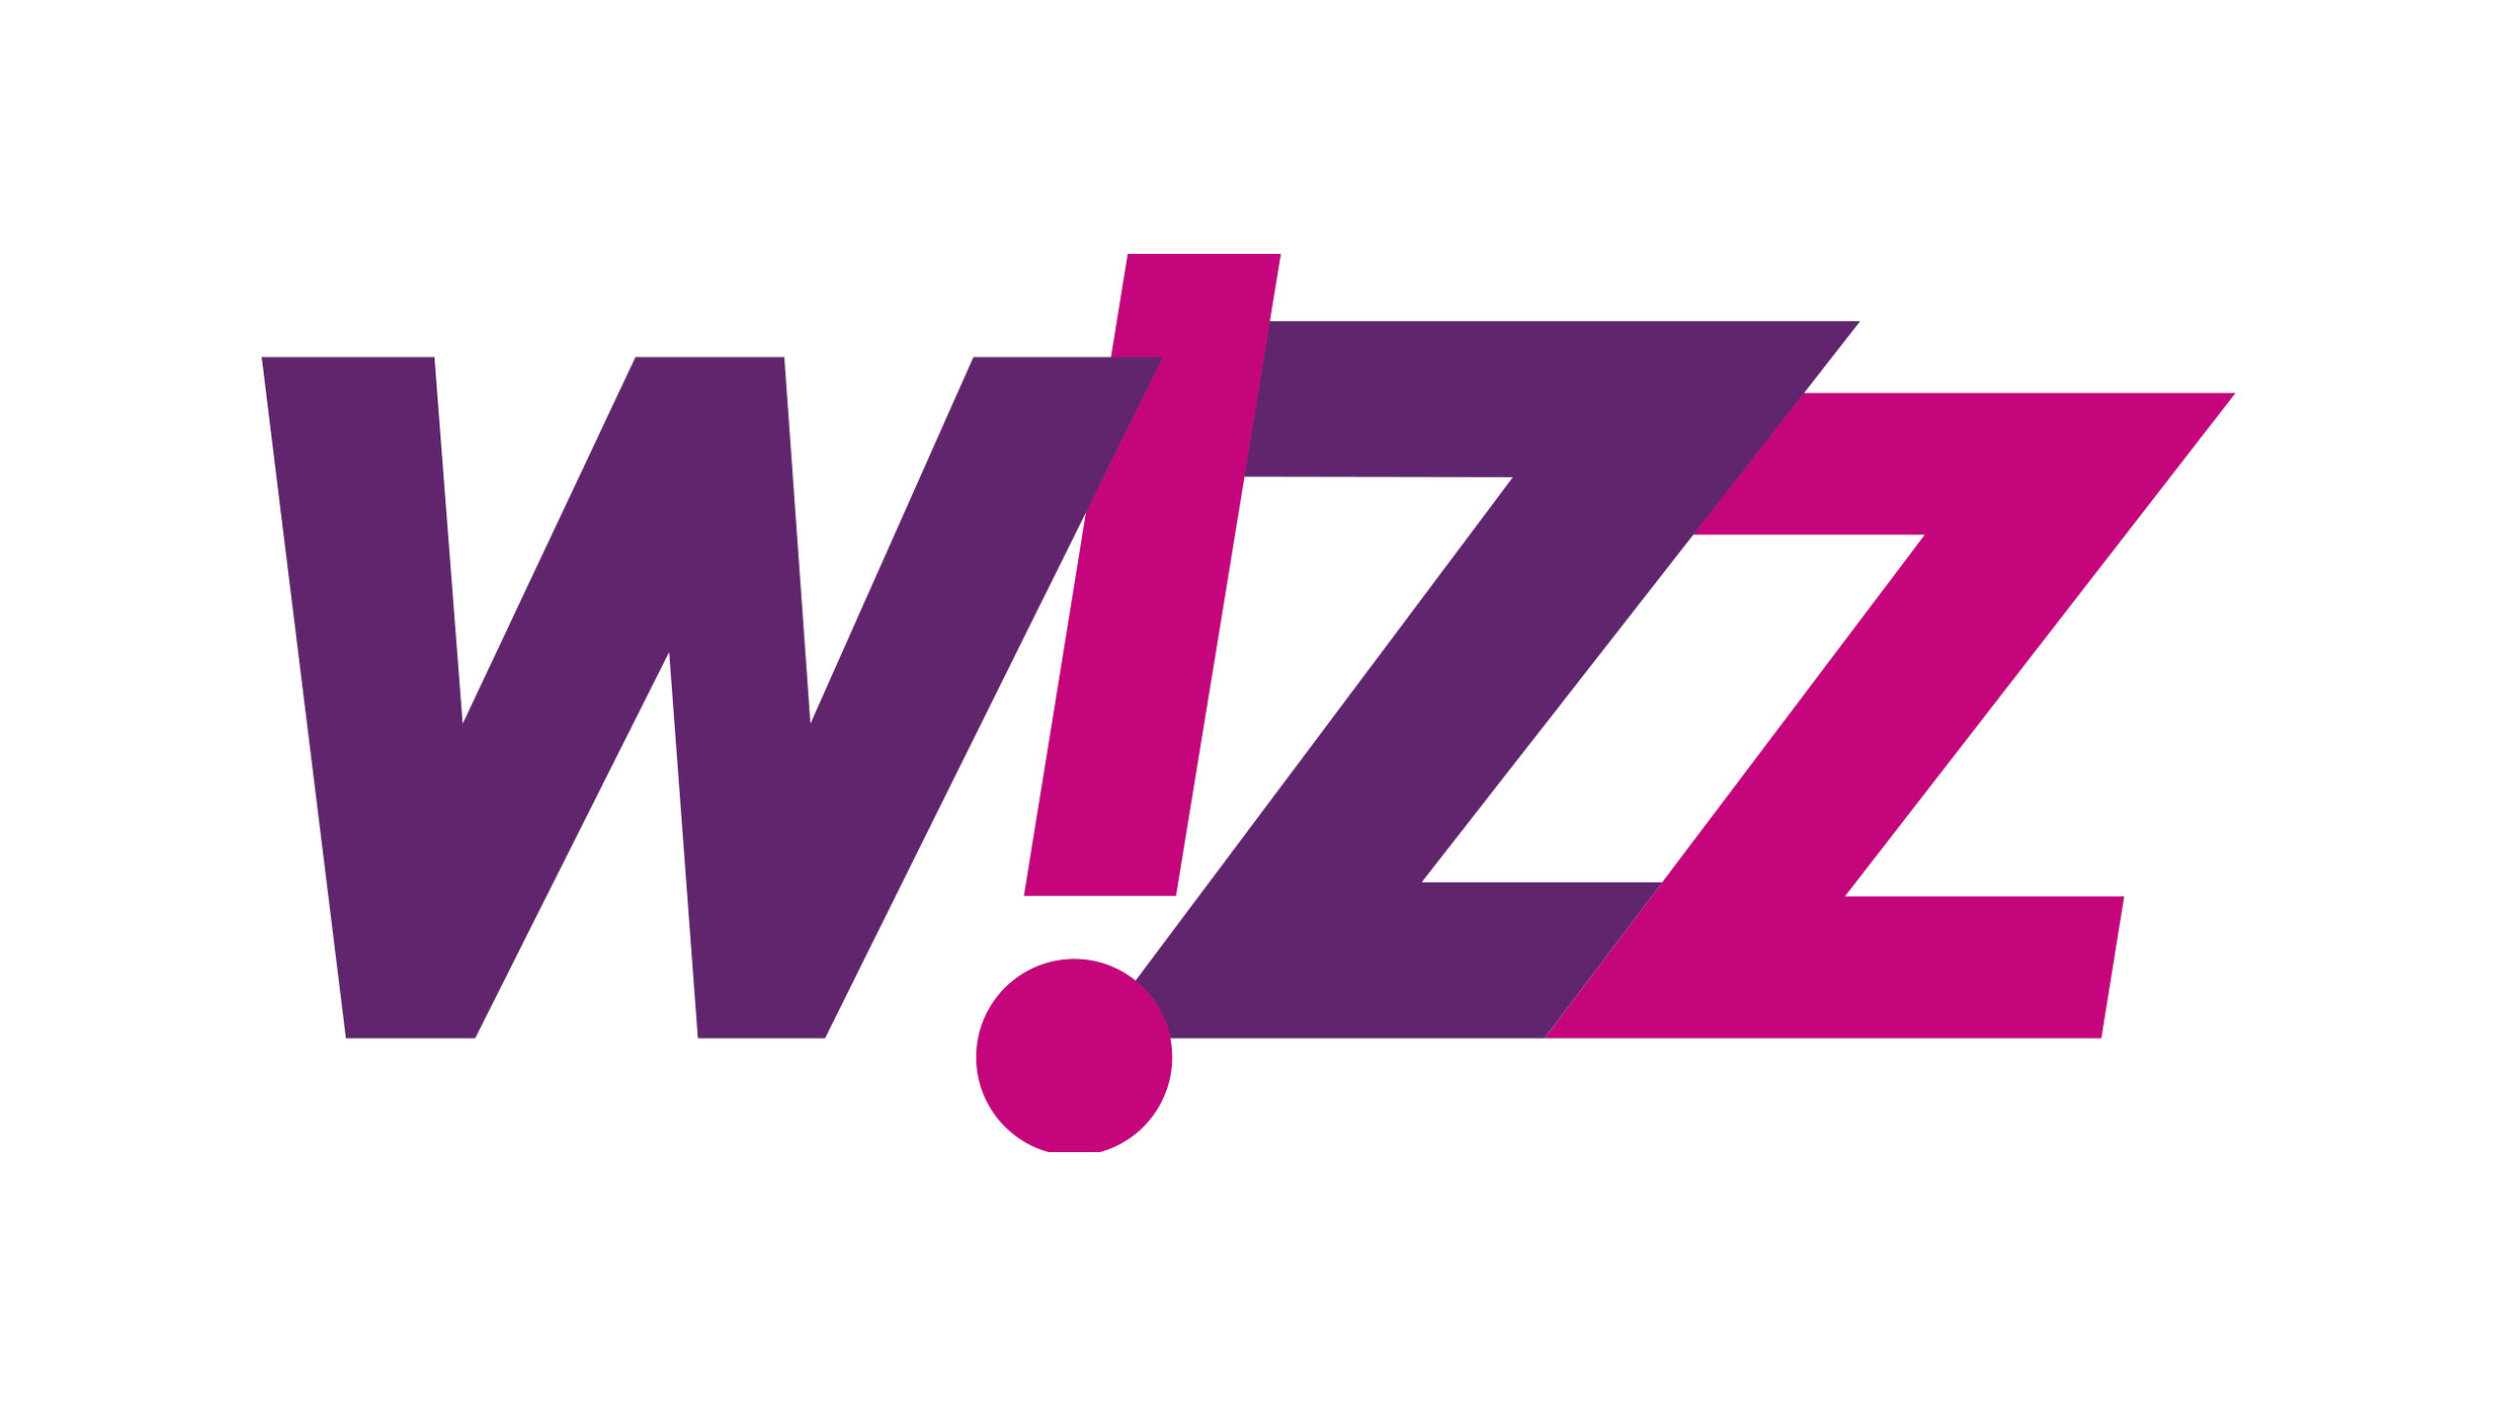 Logotypy19.jpg